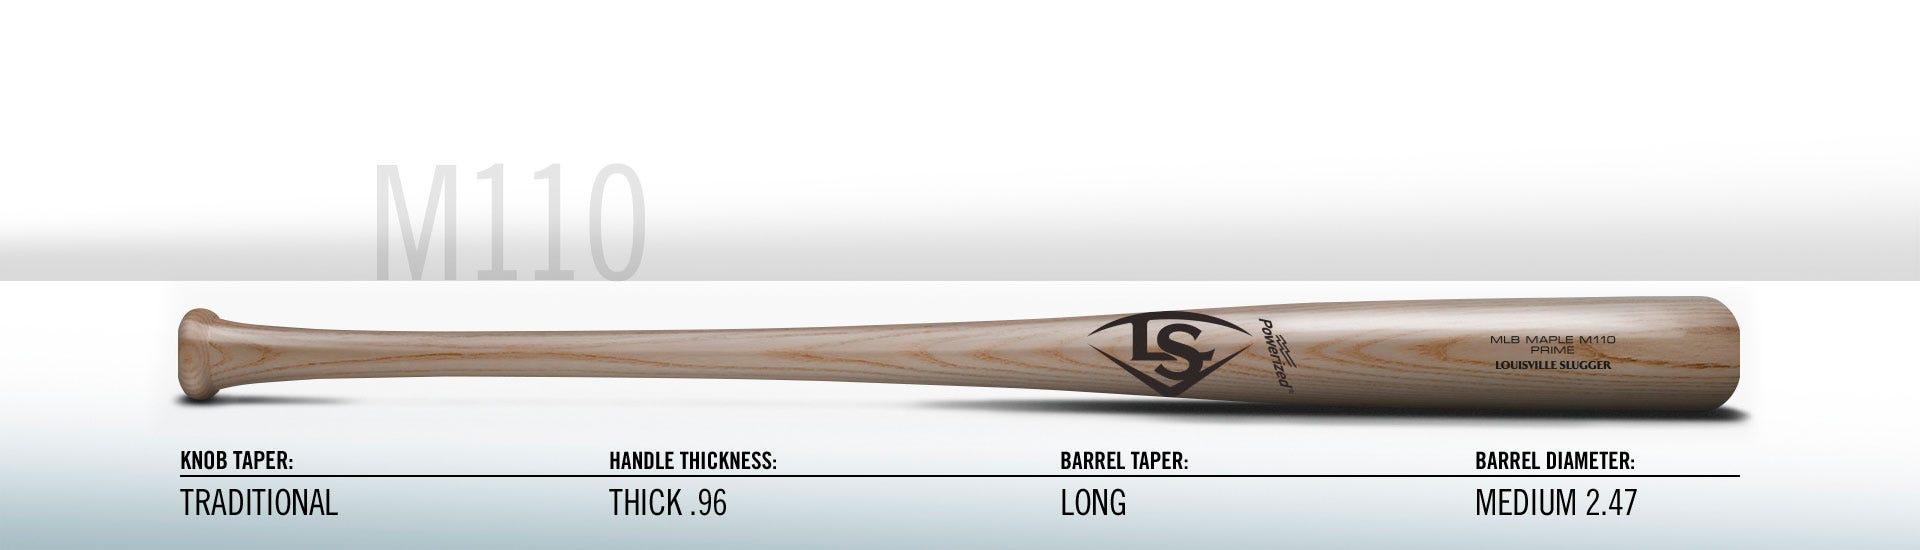 Baseball Bat Guide - How to Choose a Baseball Bat